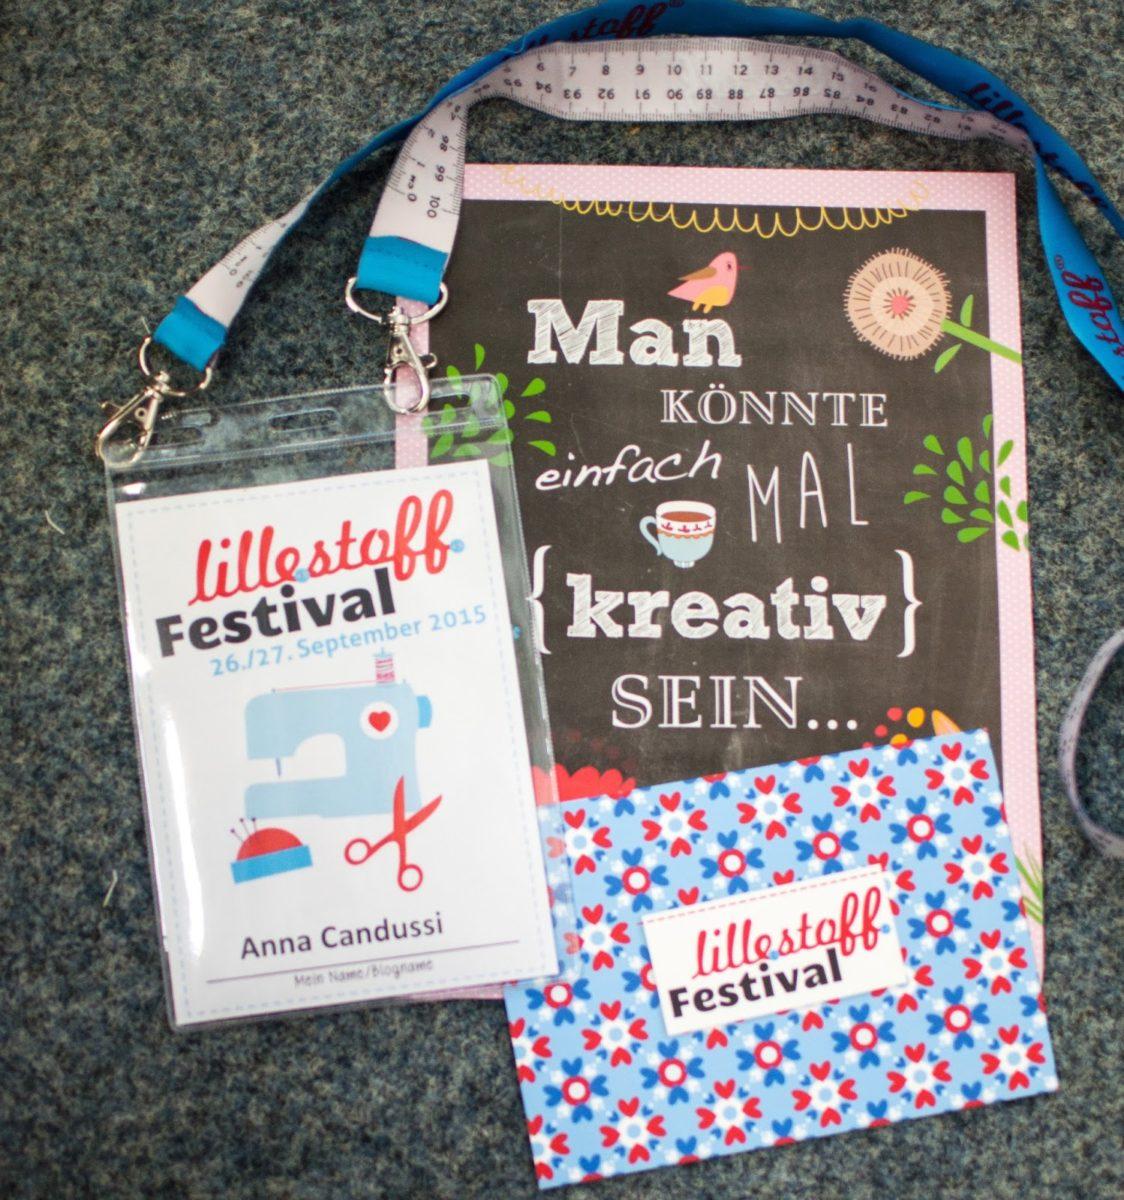 http://www.donkrawallo.at/2015/09/ein-blindes-huhn-lillestofffestival.html